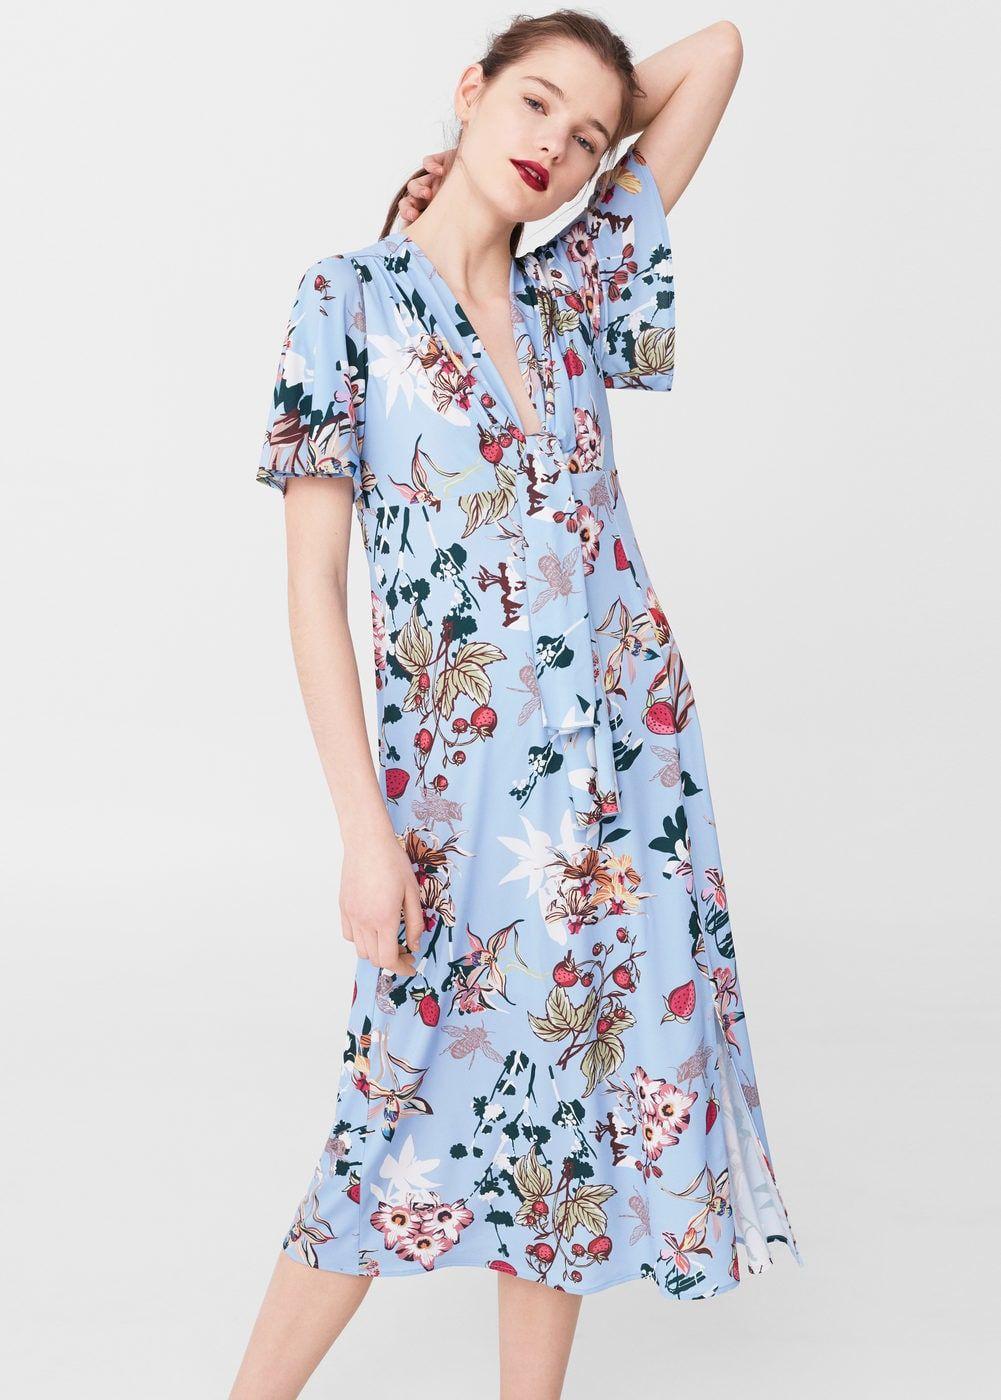 00bd17cb4 Floral-print flowy dress - Women in 2019